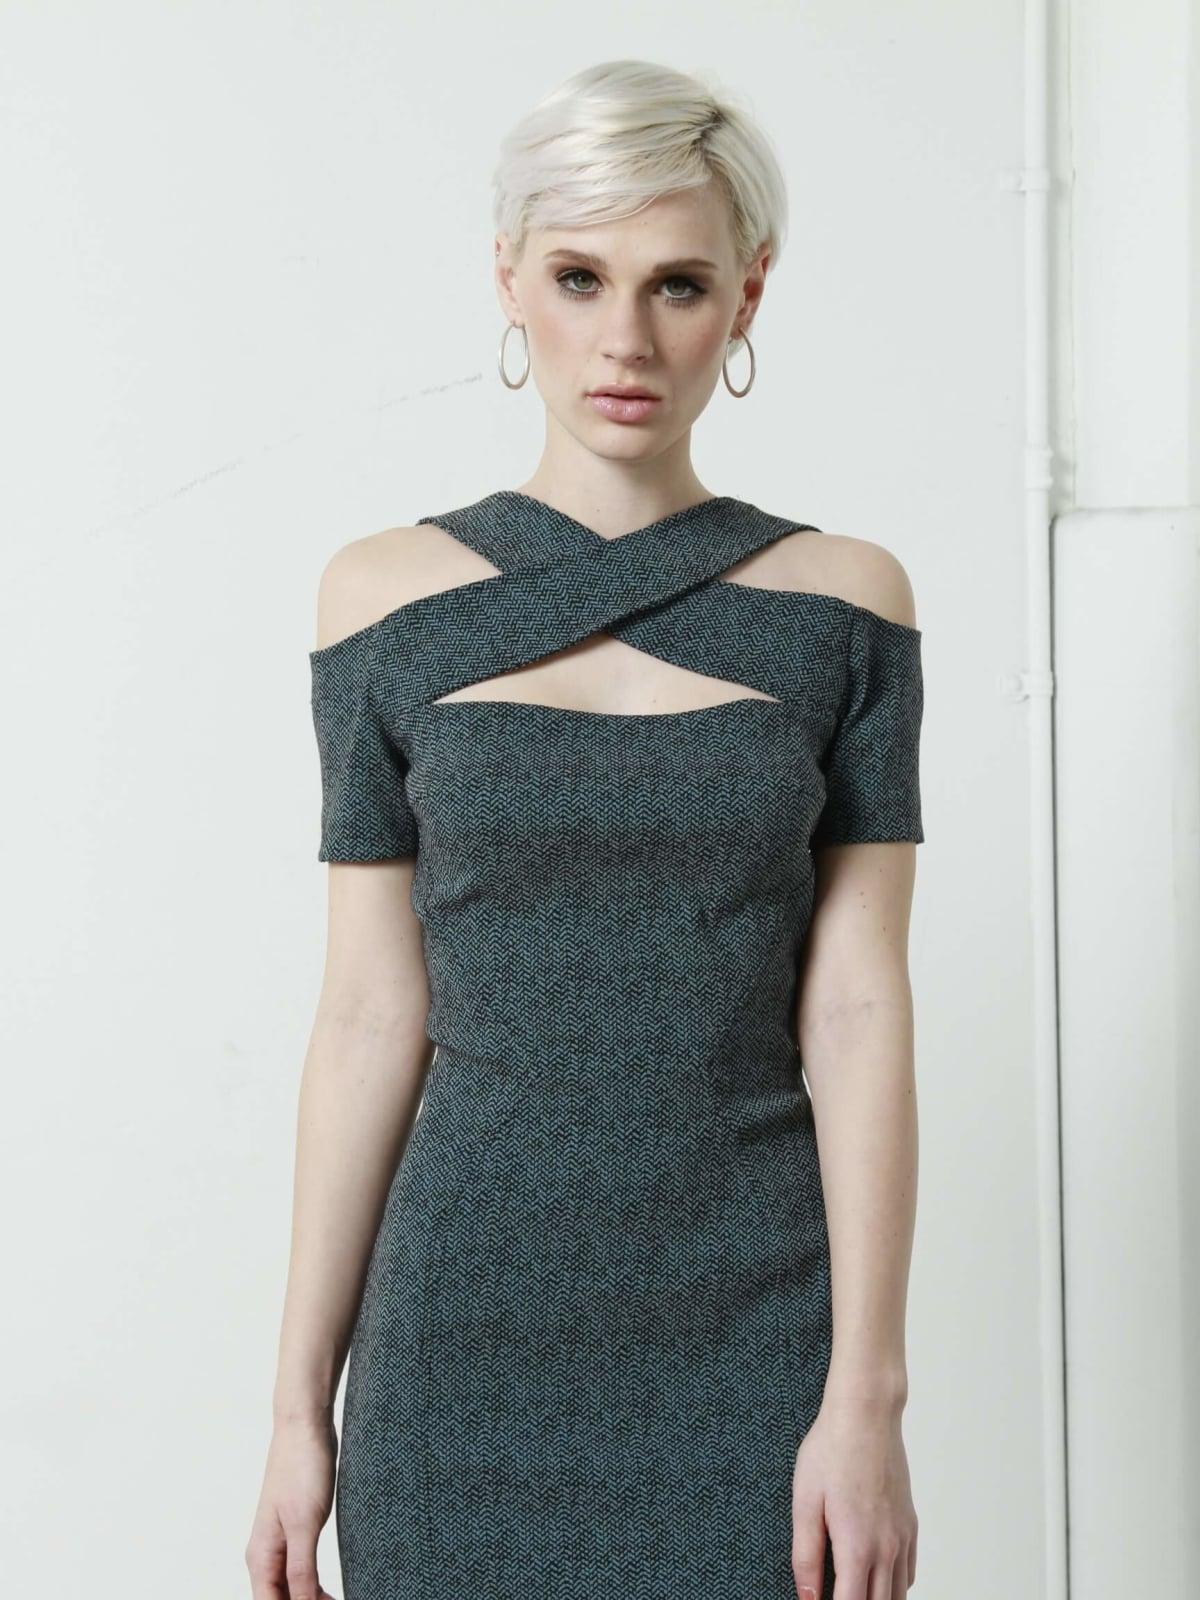 Kevan Hall criss-cross dress